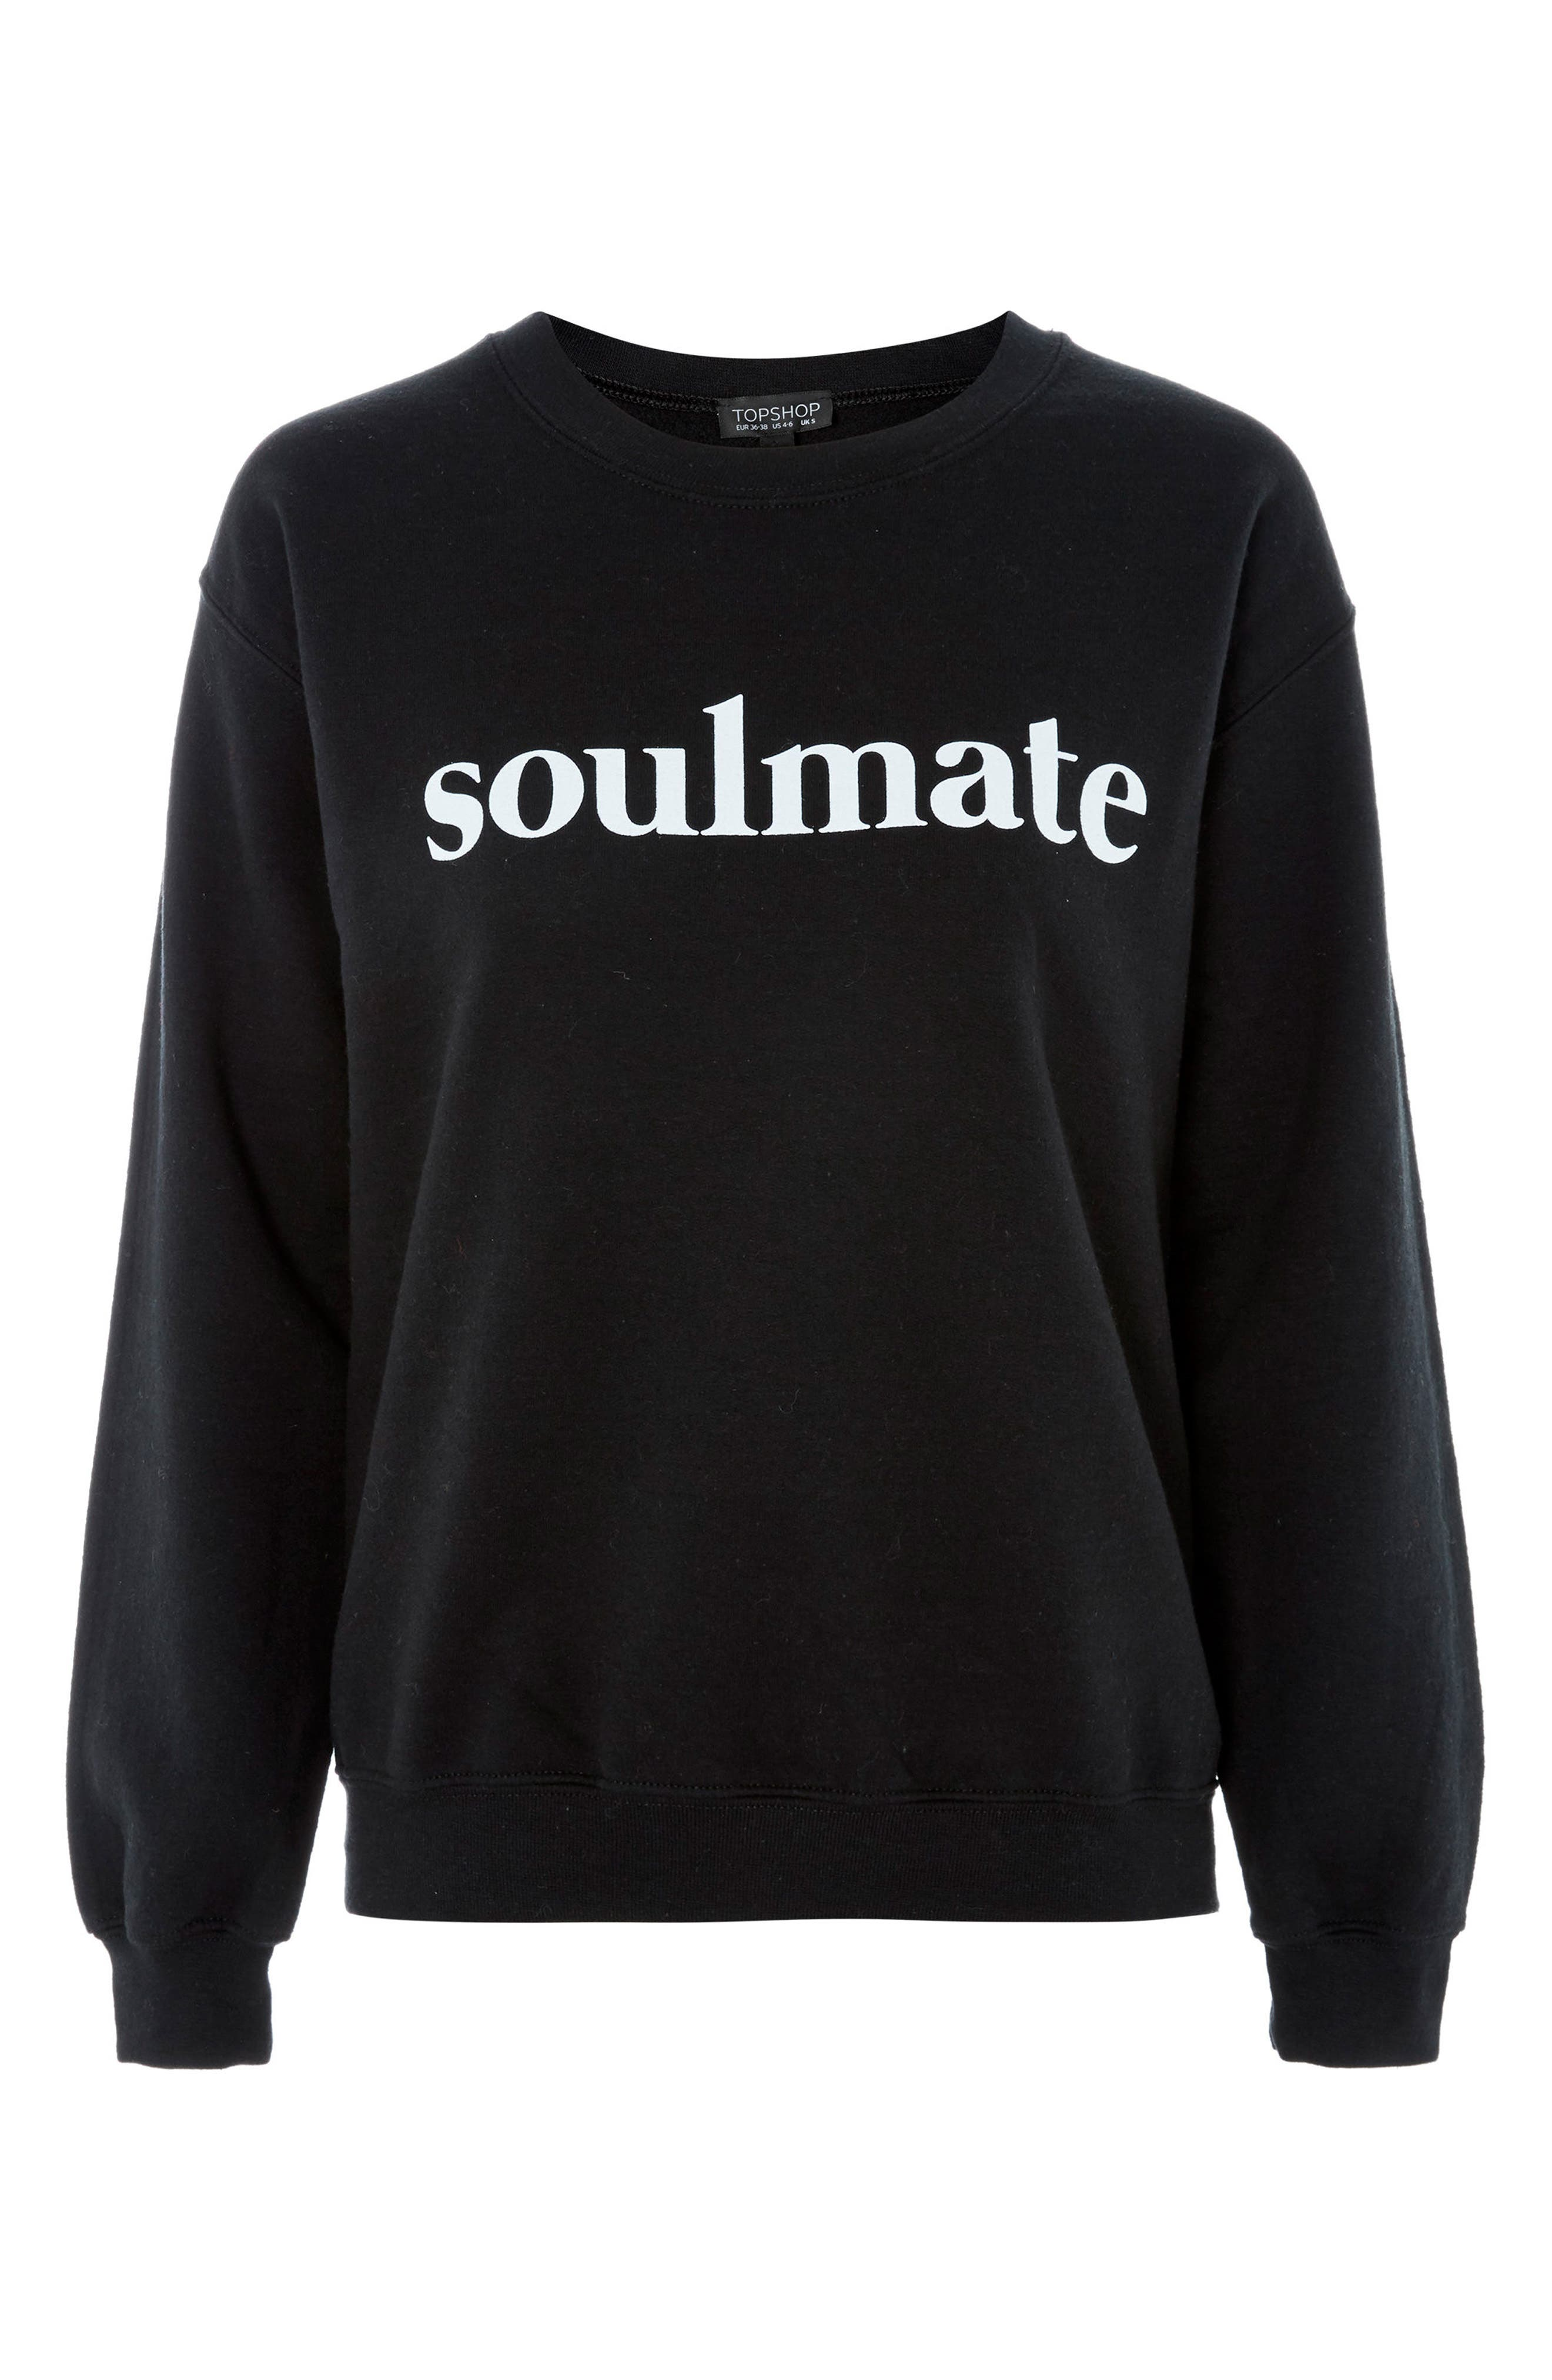 Soulmate Graphic Sweatshirt,                             Main thumbnail 1, color,                             Black Multi